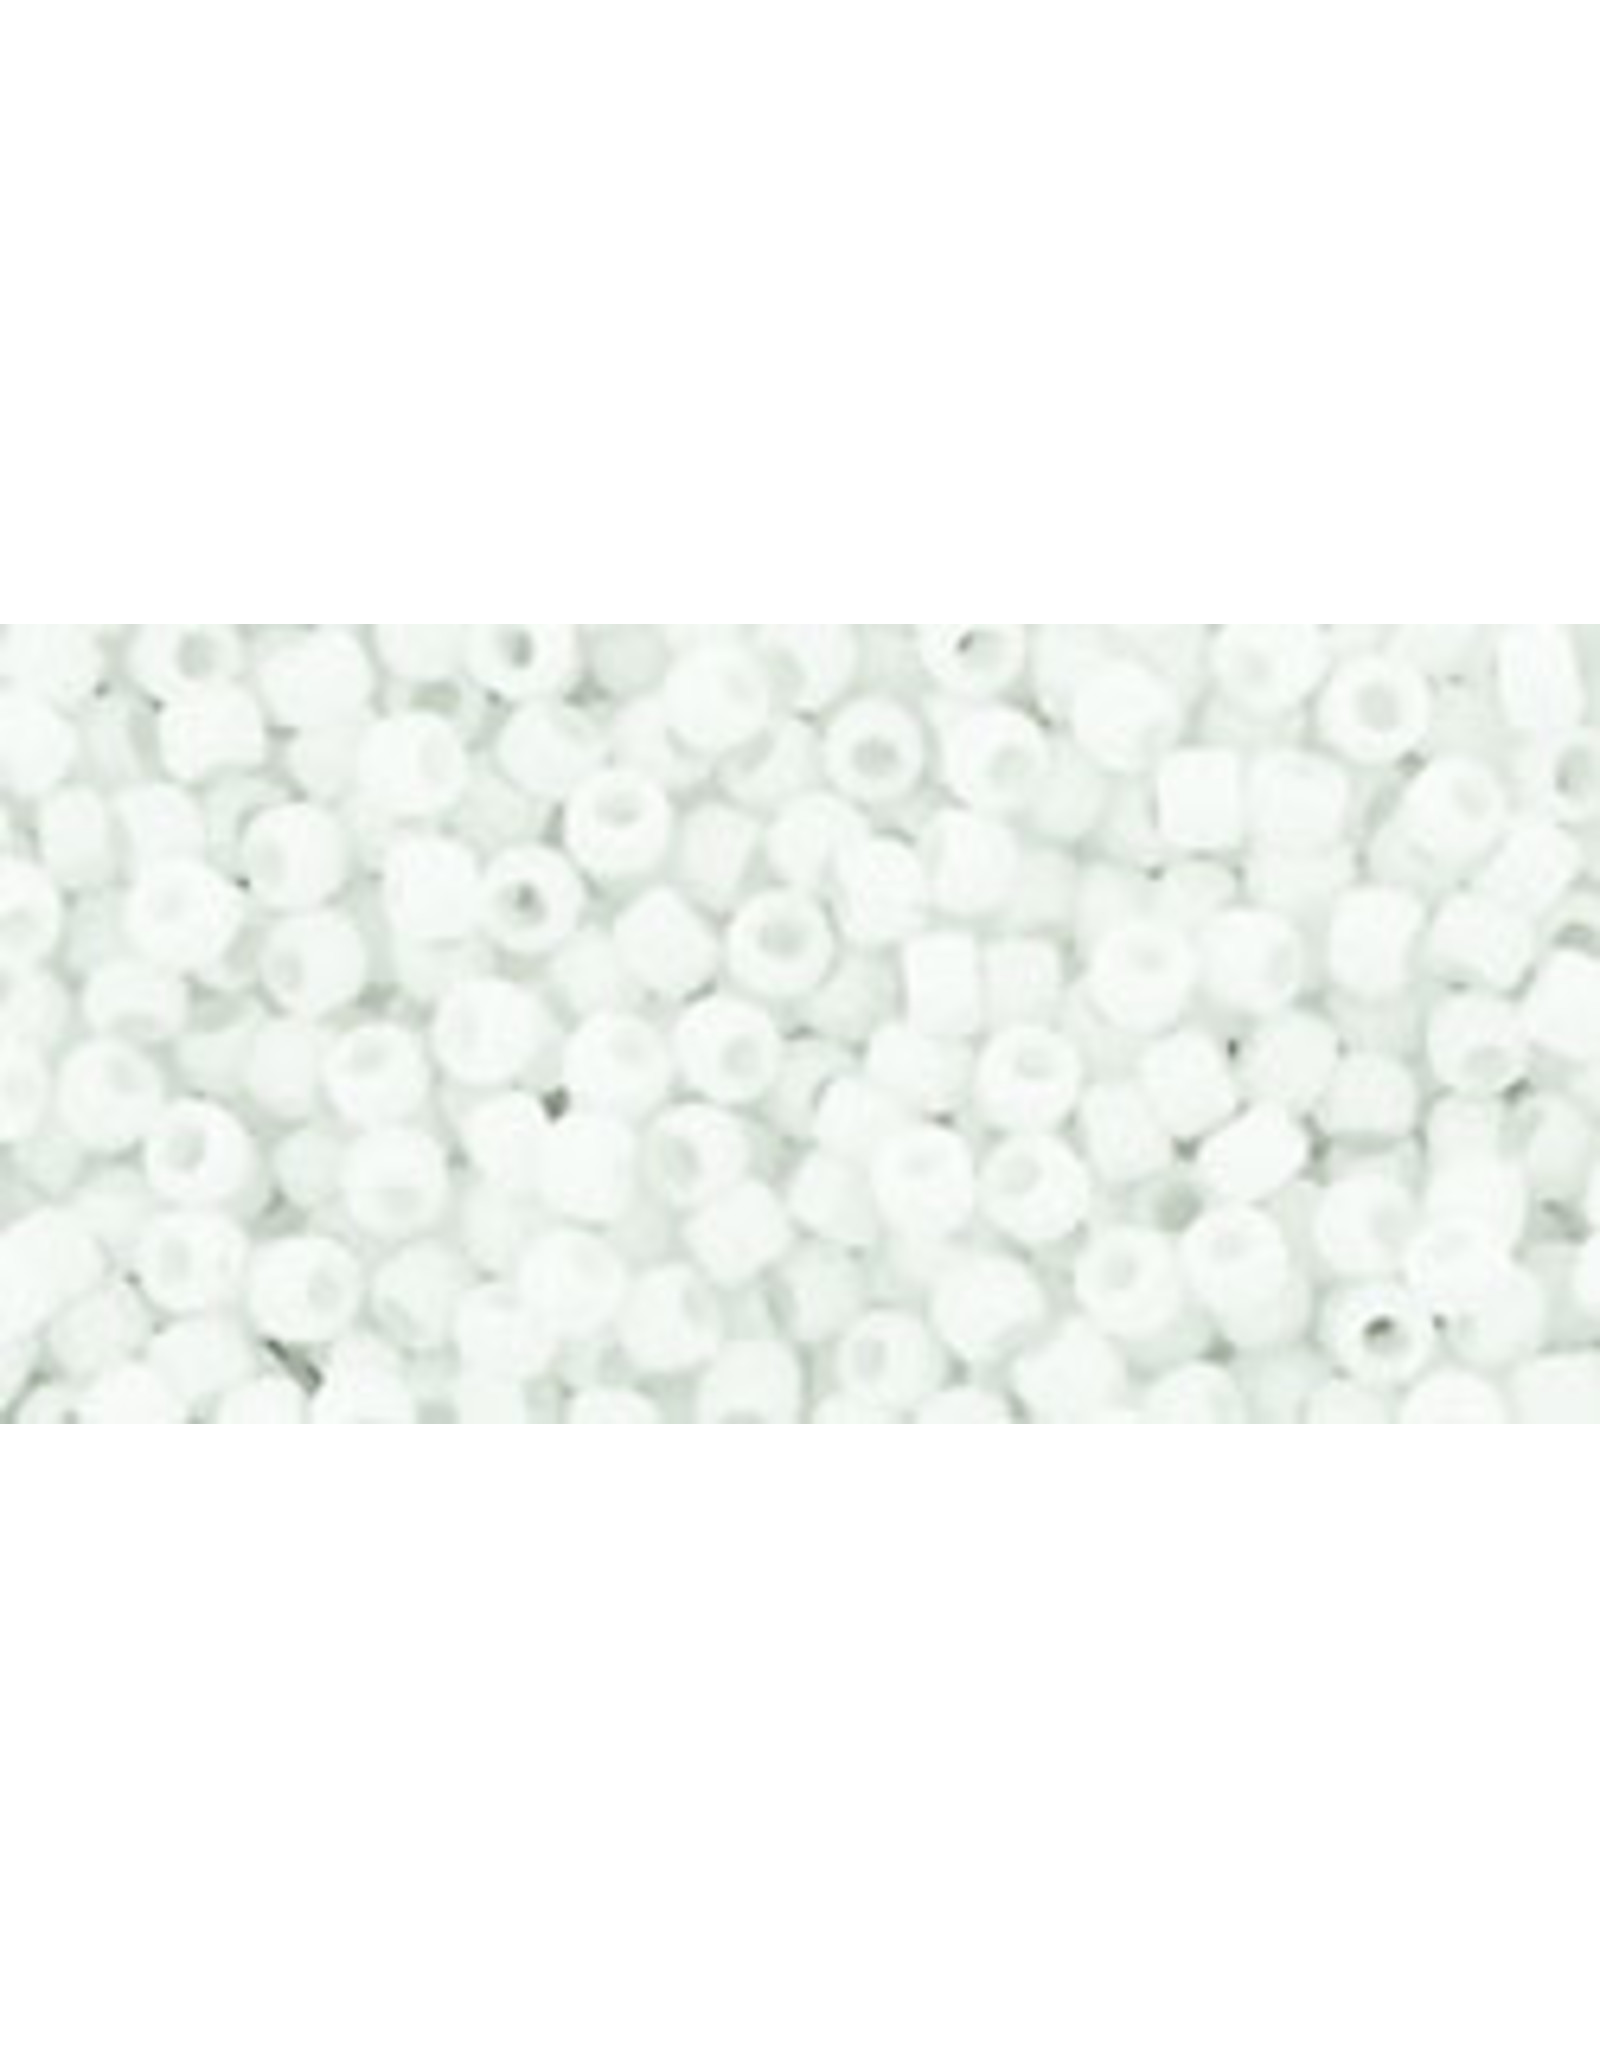 Toho 41fB 15  Round 20g  Opaque White Matte